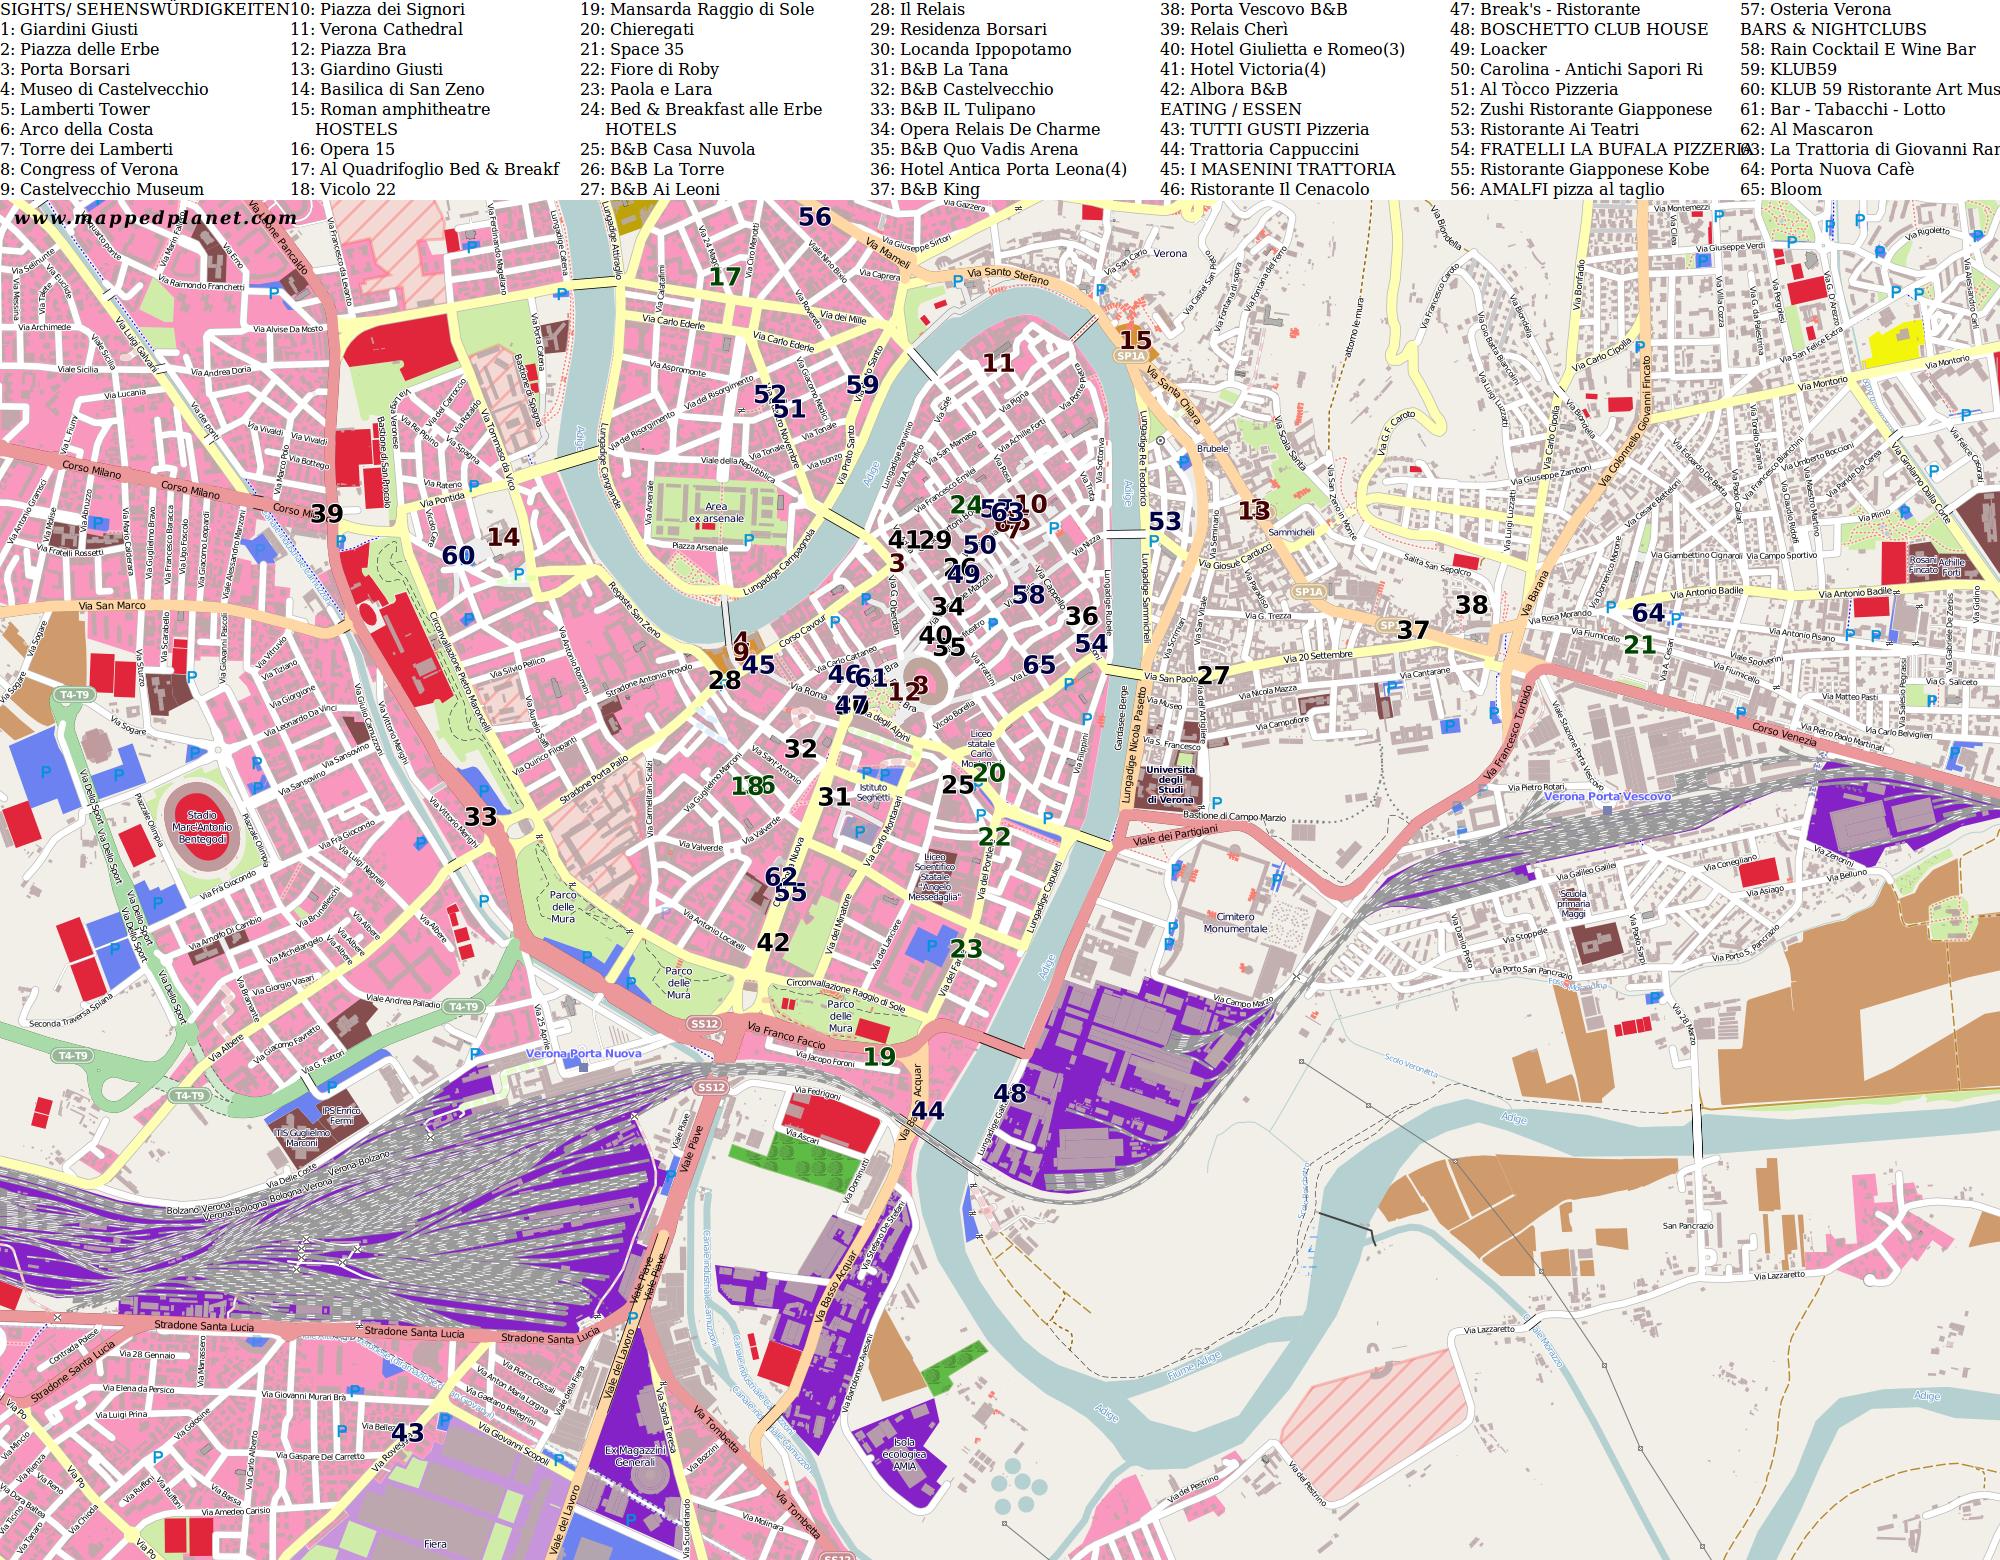 Verona Italien Karte.Karten Und Stadtpläne Verona